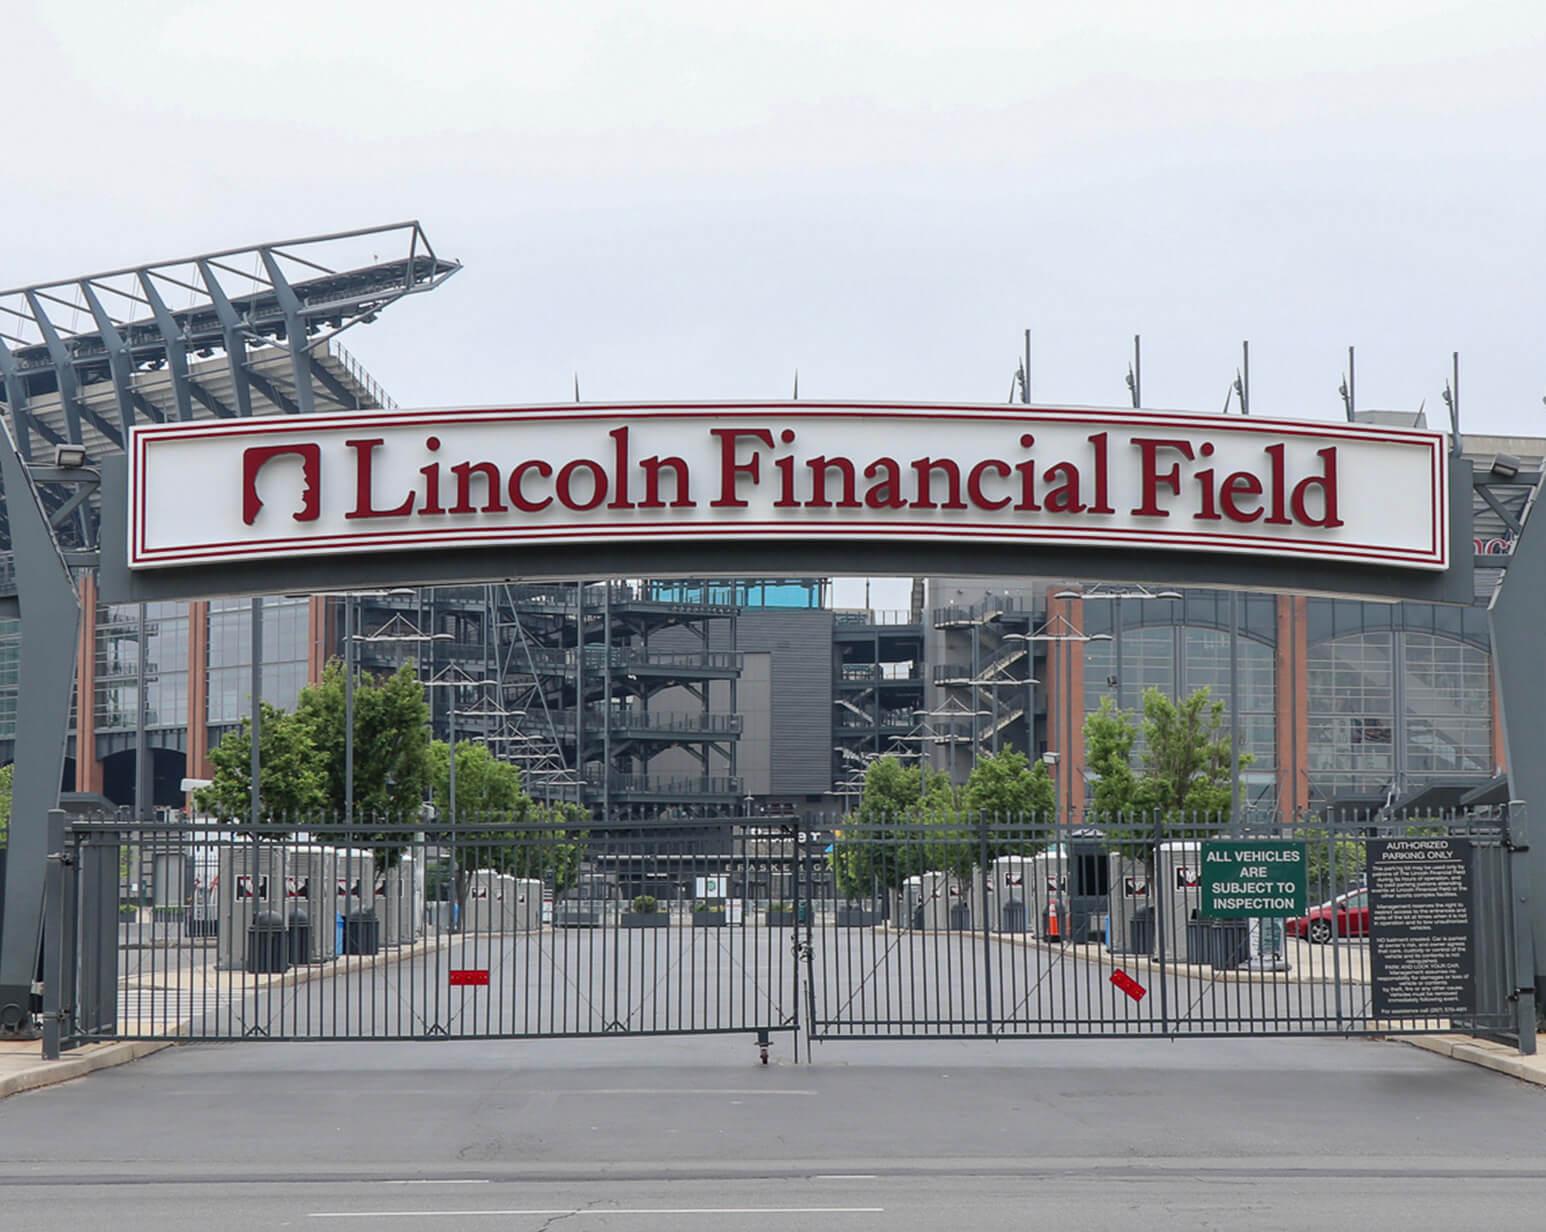 Where do the Philadelphia Eagles play football?